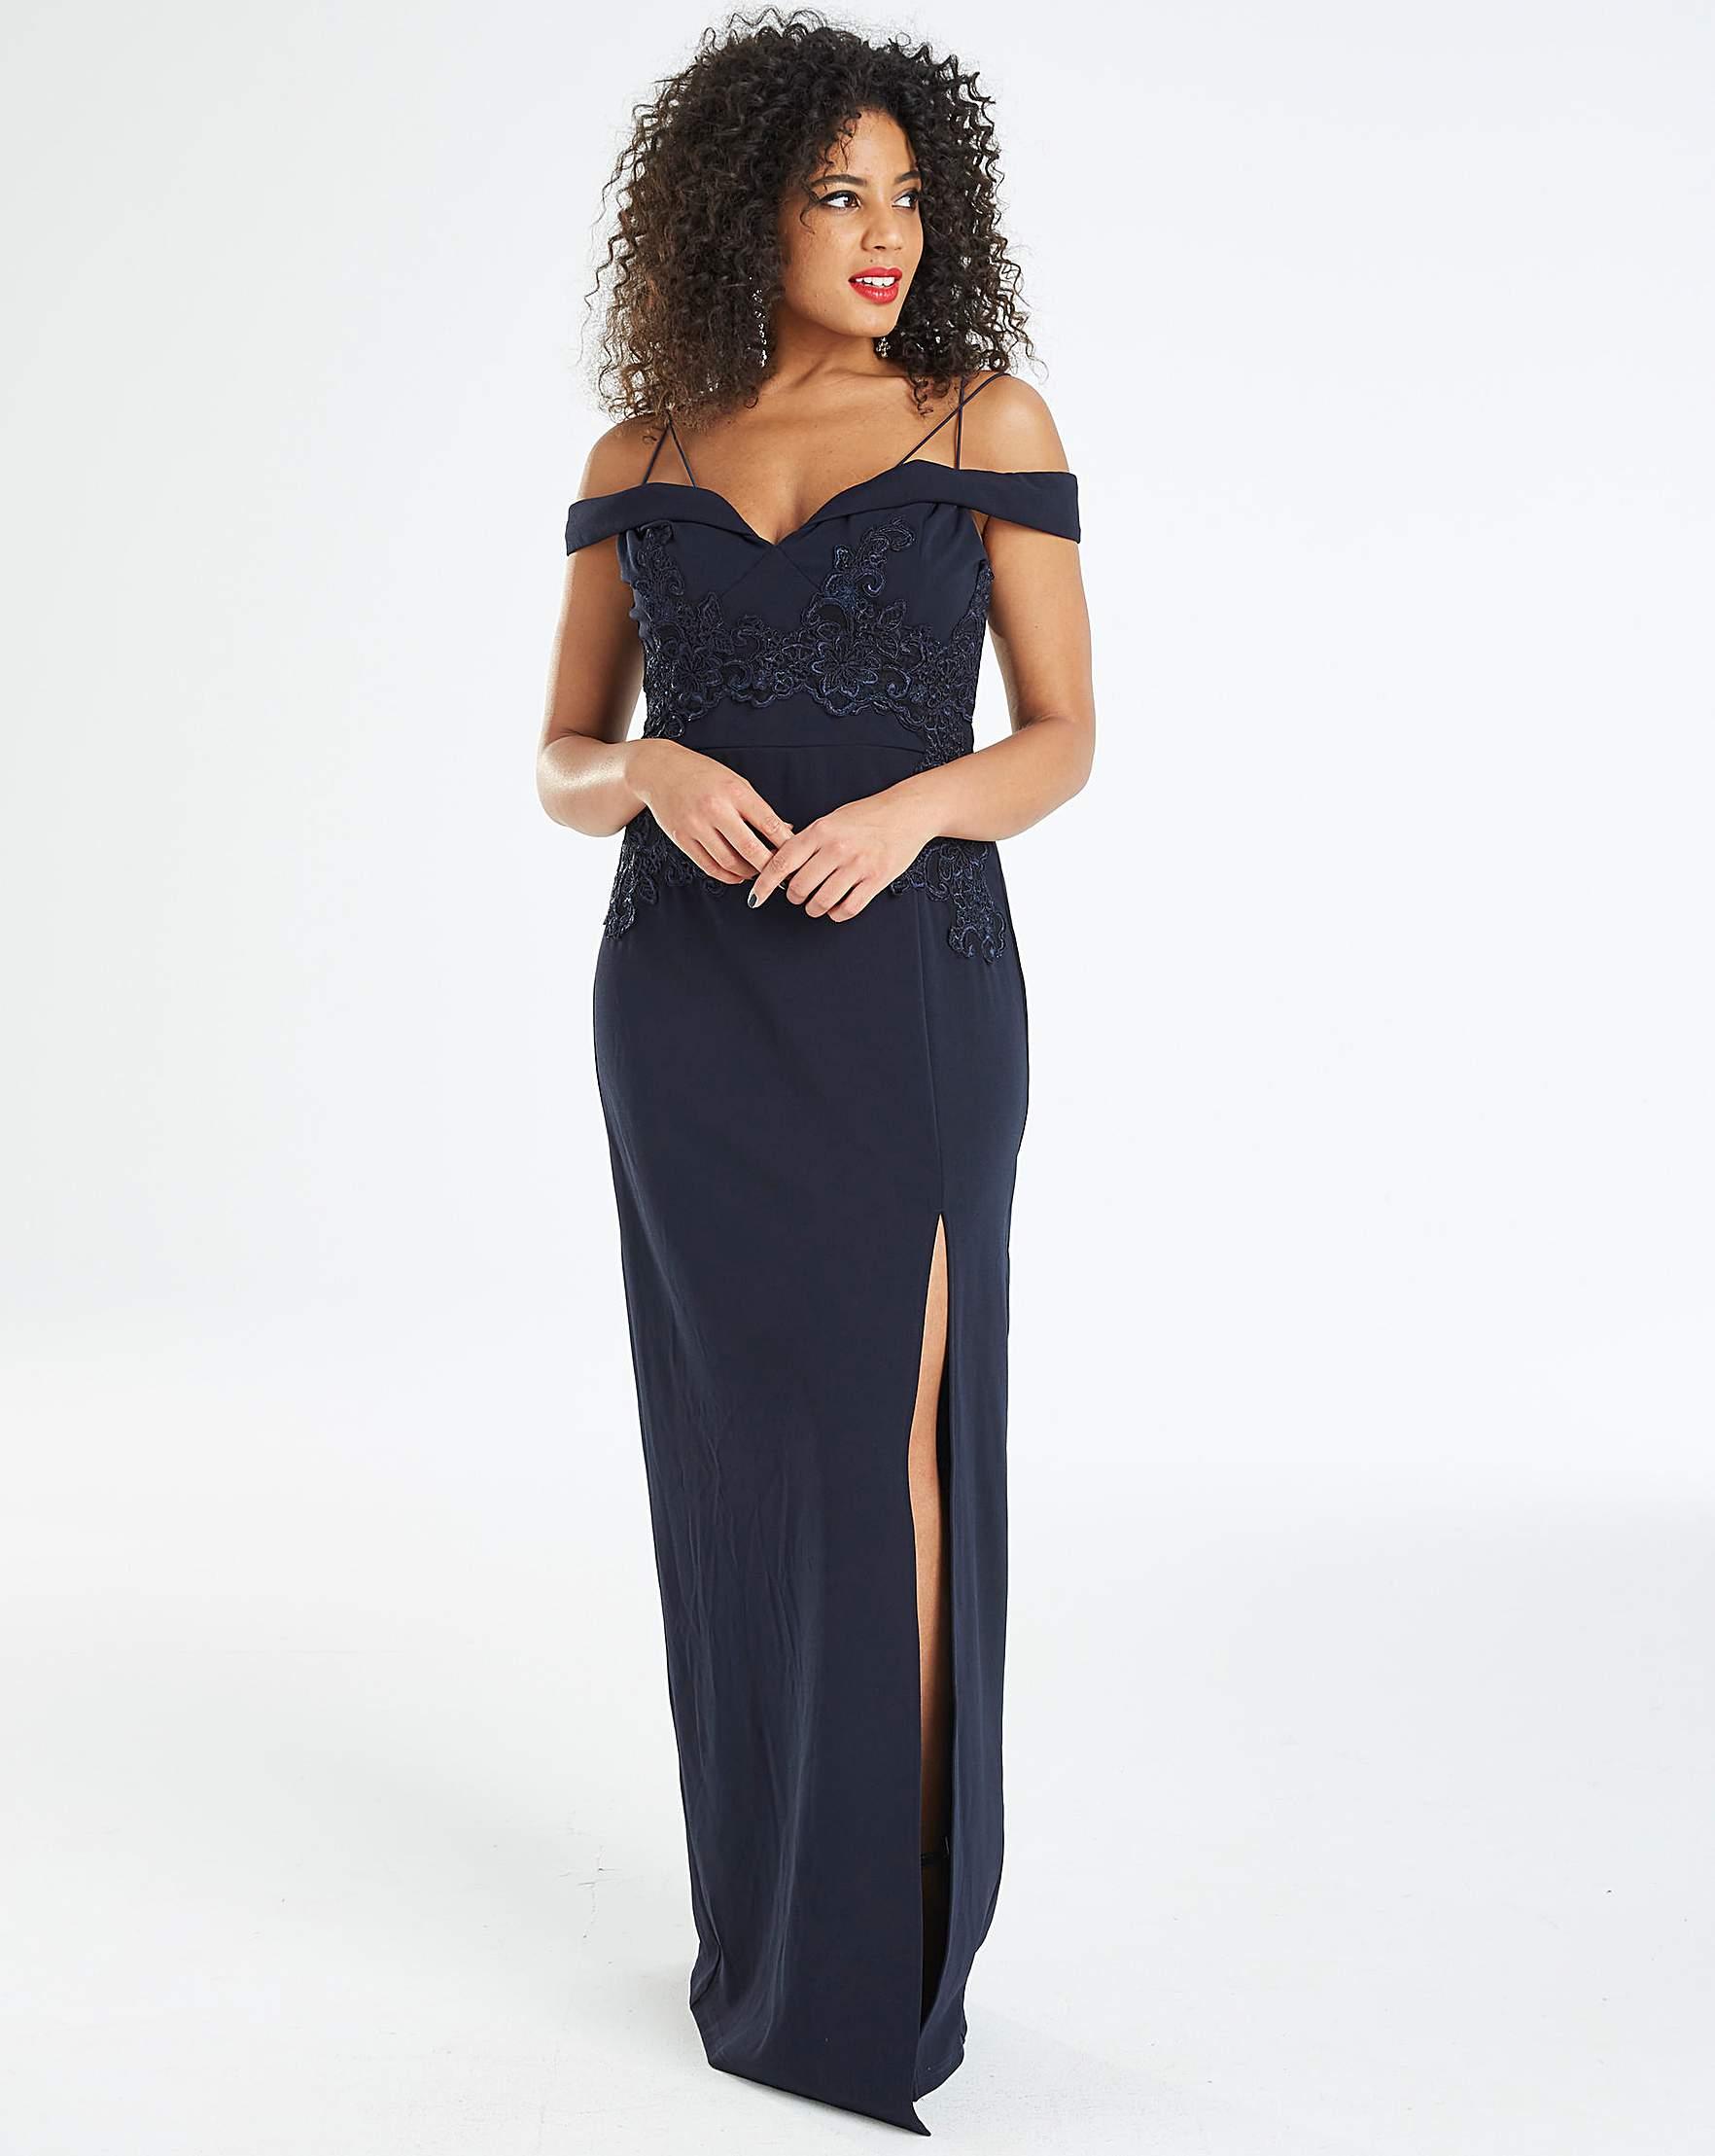 818afff4a5 Ax Paris Grey Long Sleeve Maxi Dress With Lace Top | Huston Fislar ...